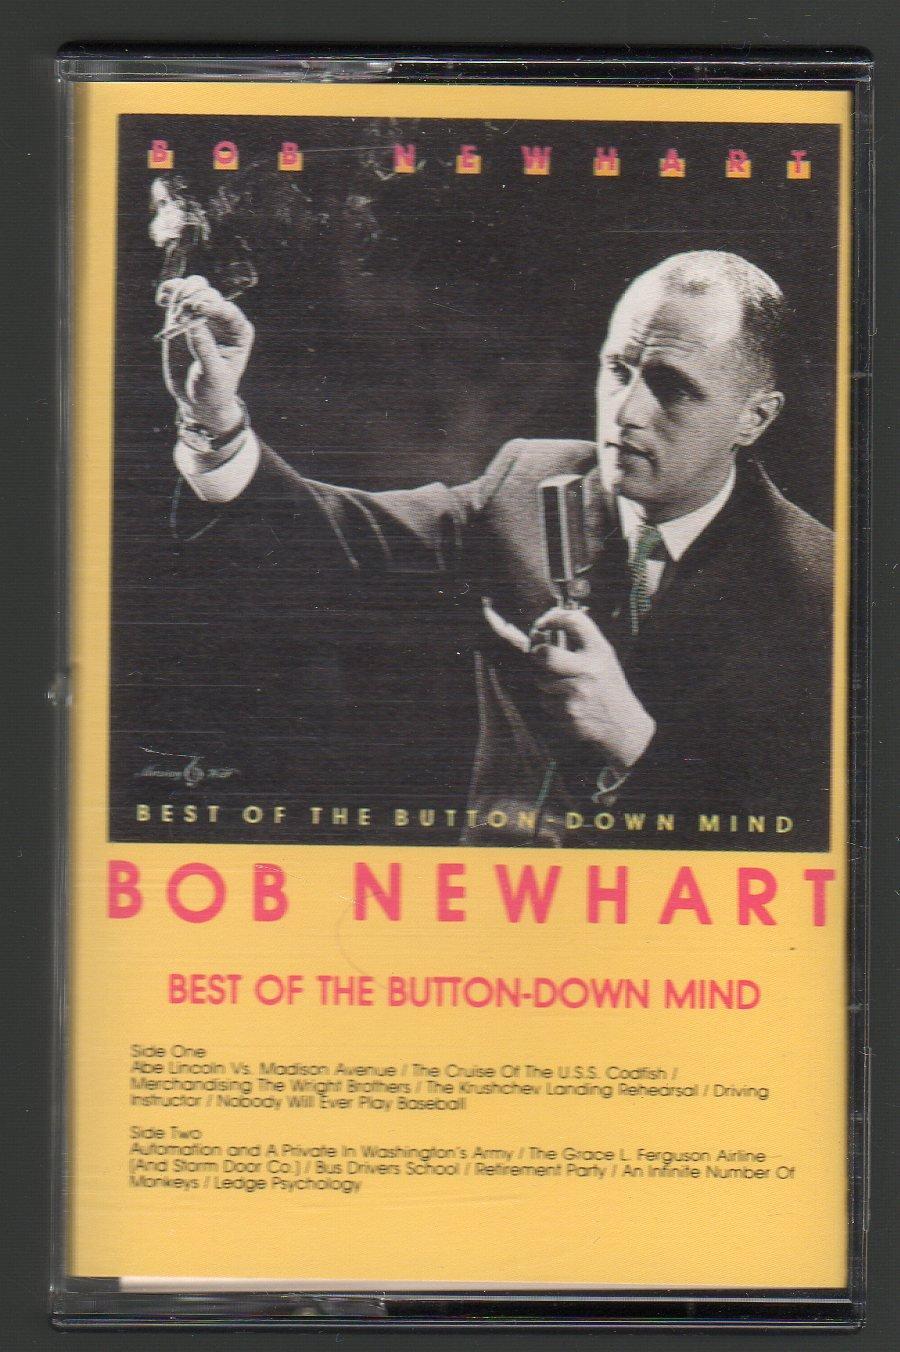 Bob Newhart - Best Of The Button-Down Mind Cassette Tape